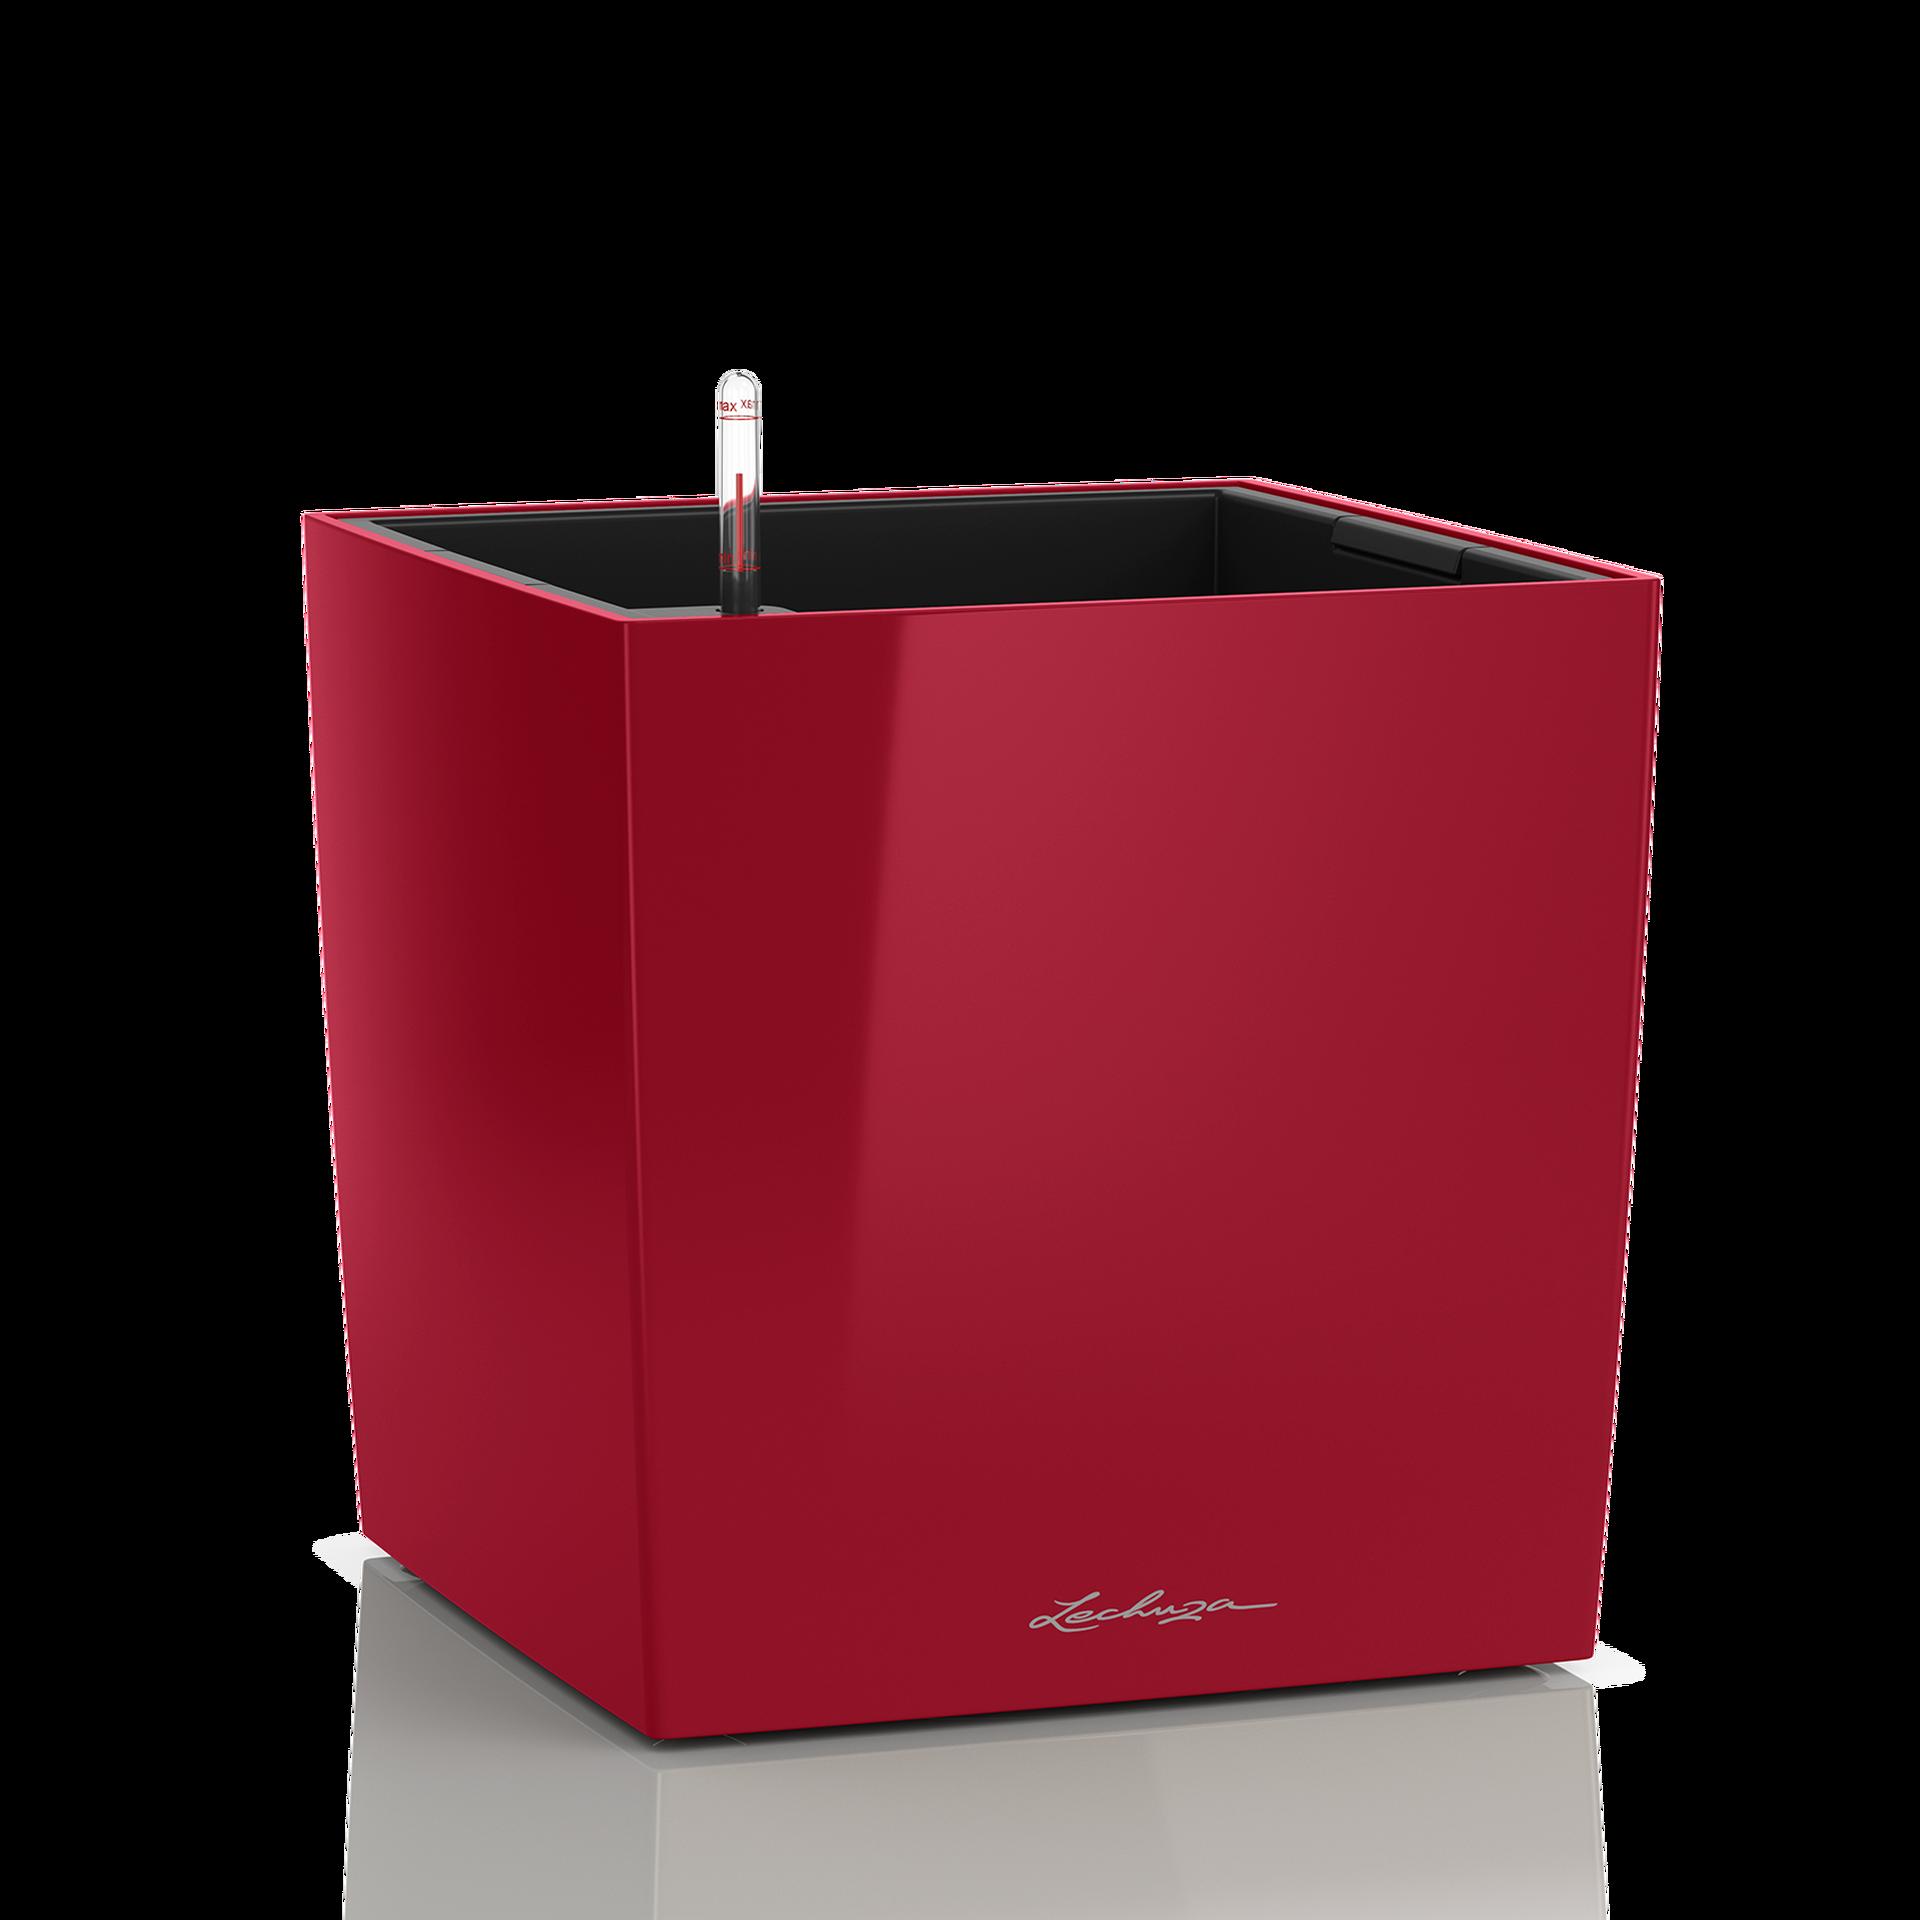 CUBE 50 rojo escarlata muy brillante